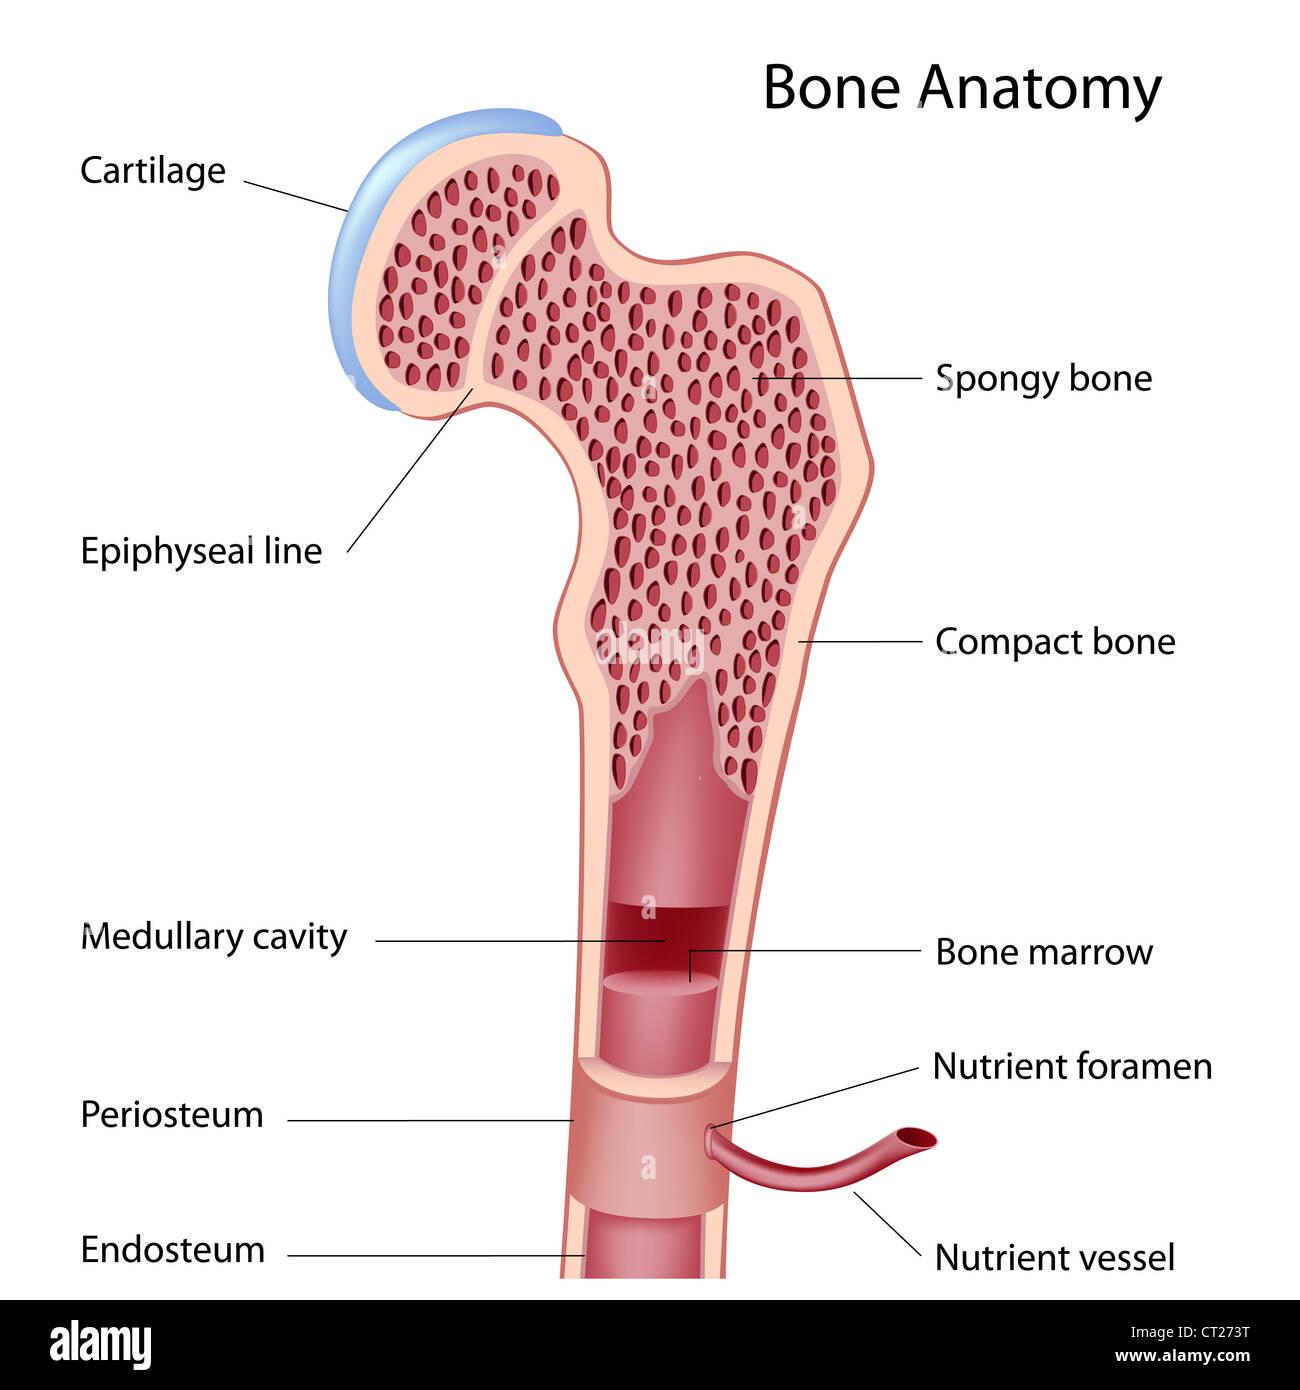 Compact Bone Tissue Stock Photos & Compact Bone Tissue Stock Images ...